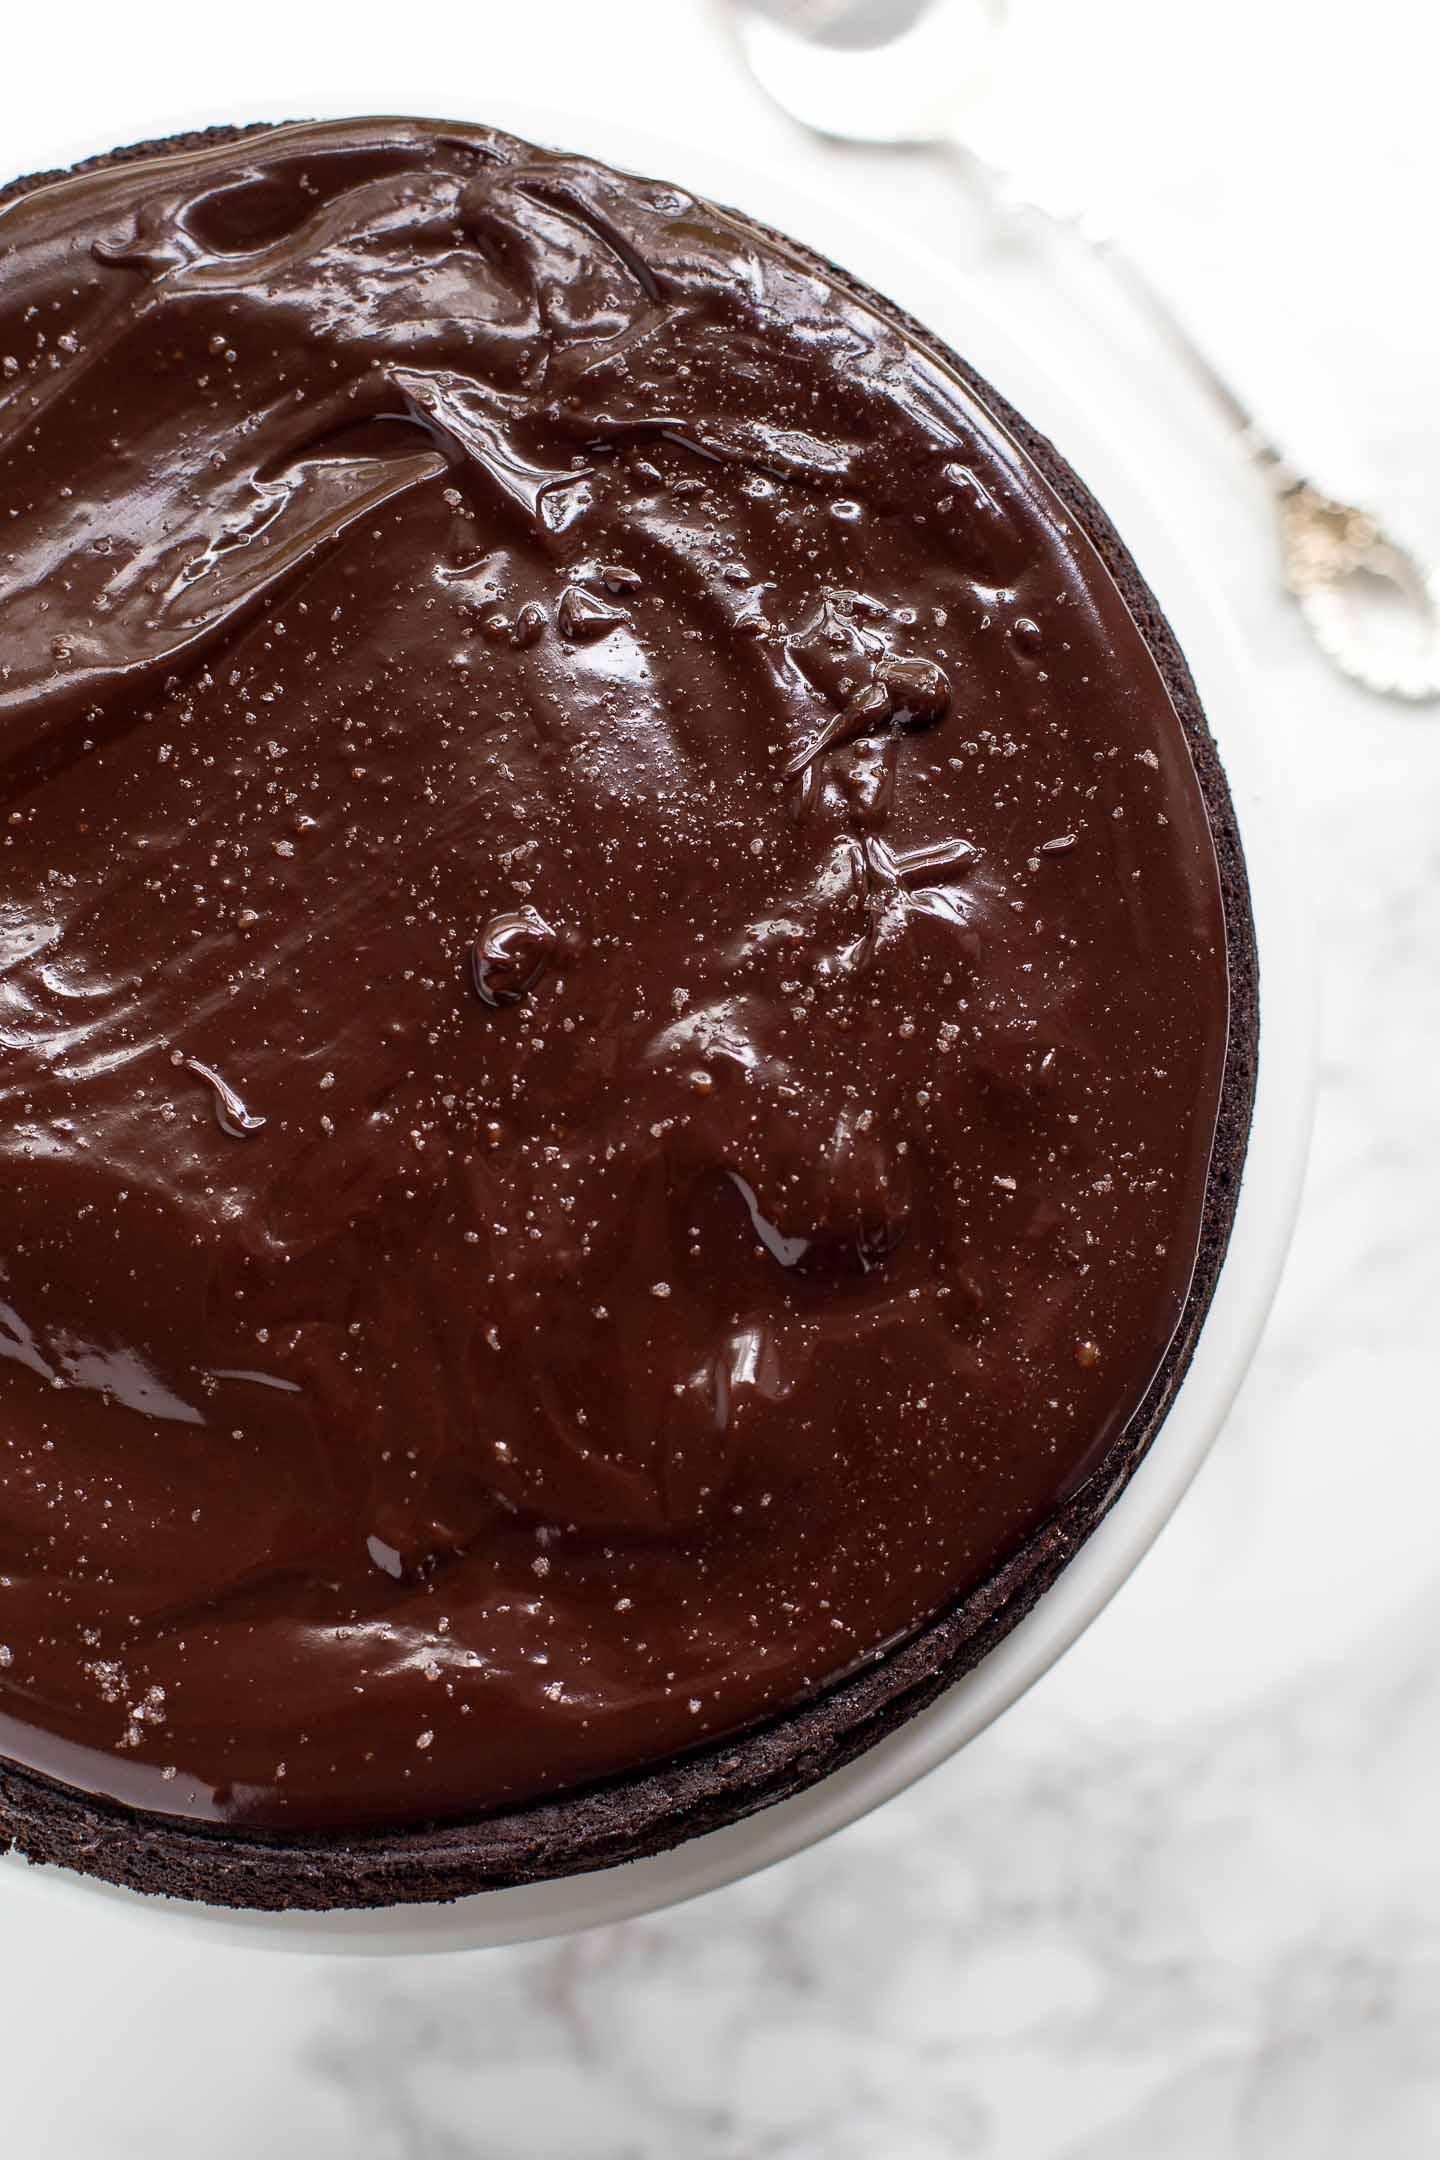 flourless chocolate cake overview photo.